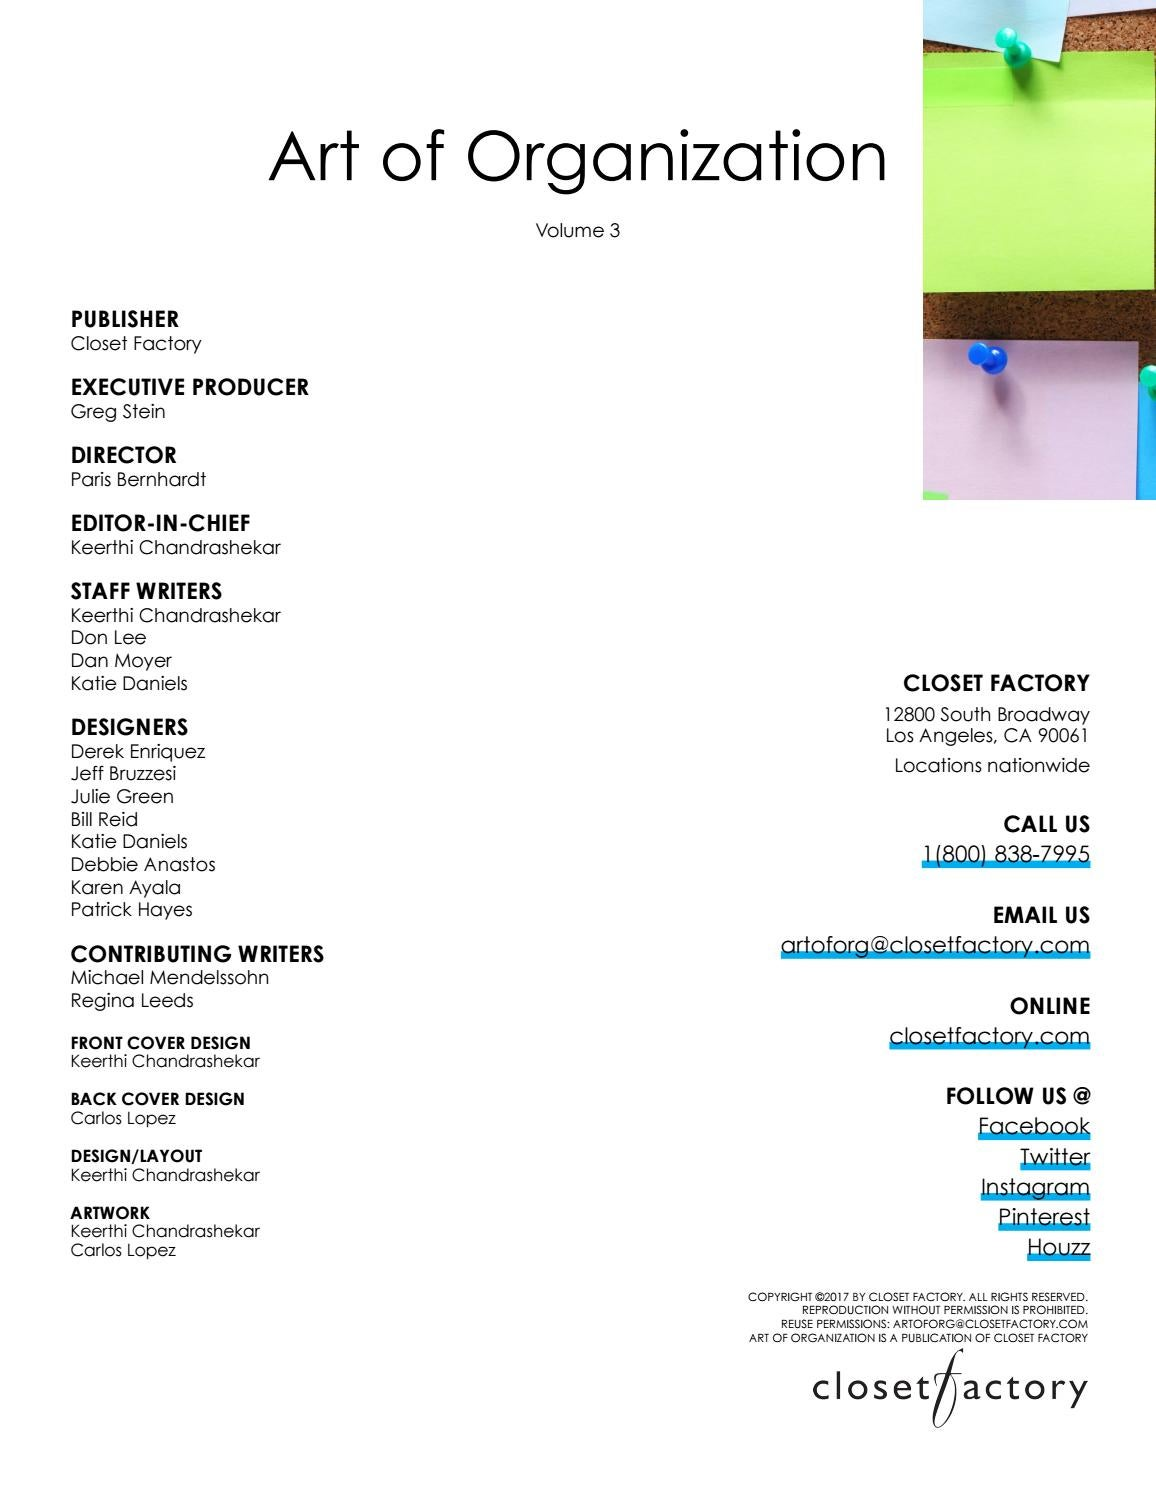 Art Of Organization Volume 3